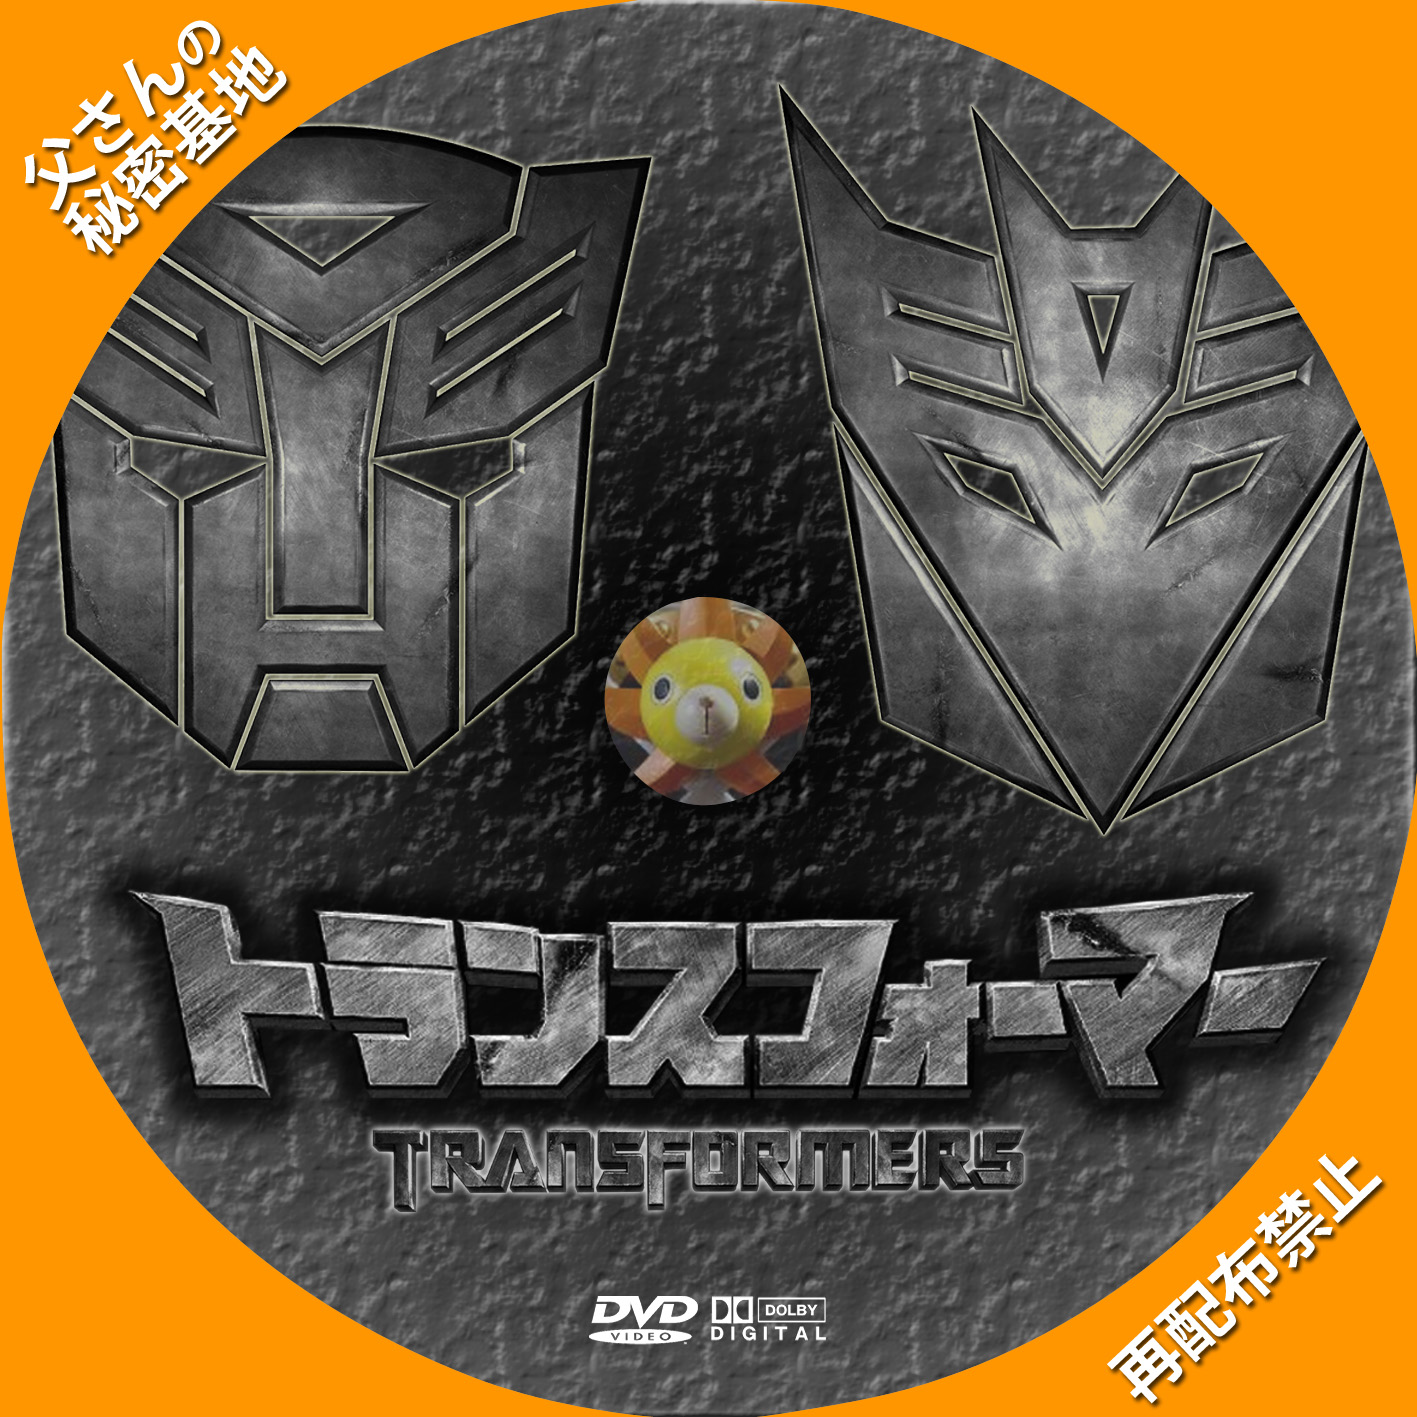 transformers_DVD_03.jpg